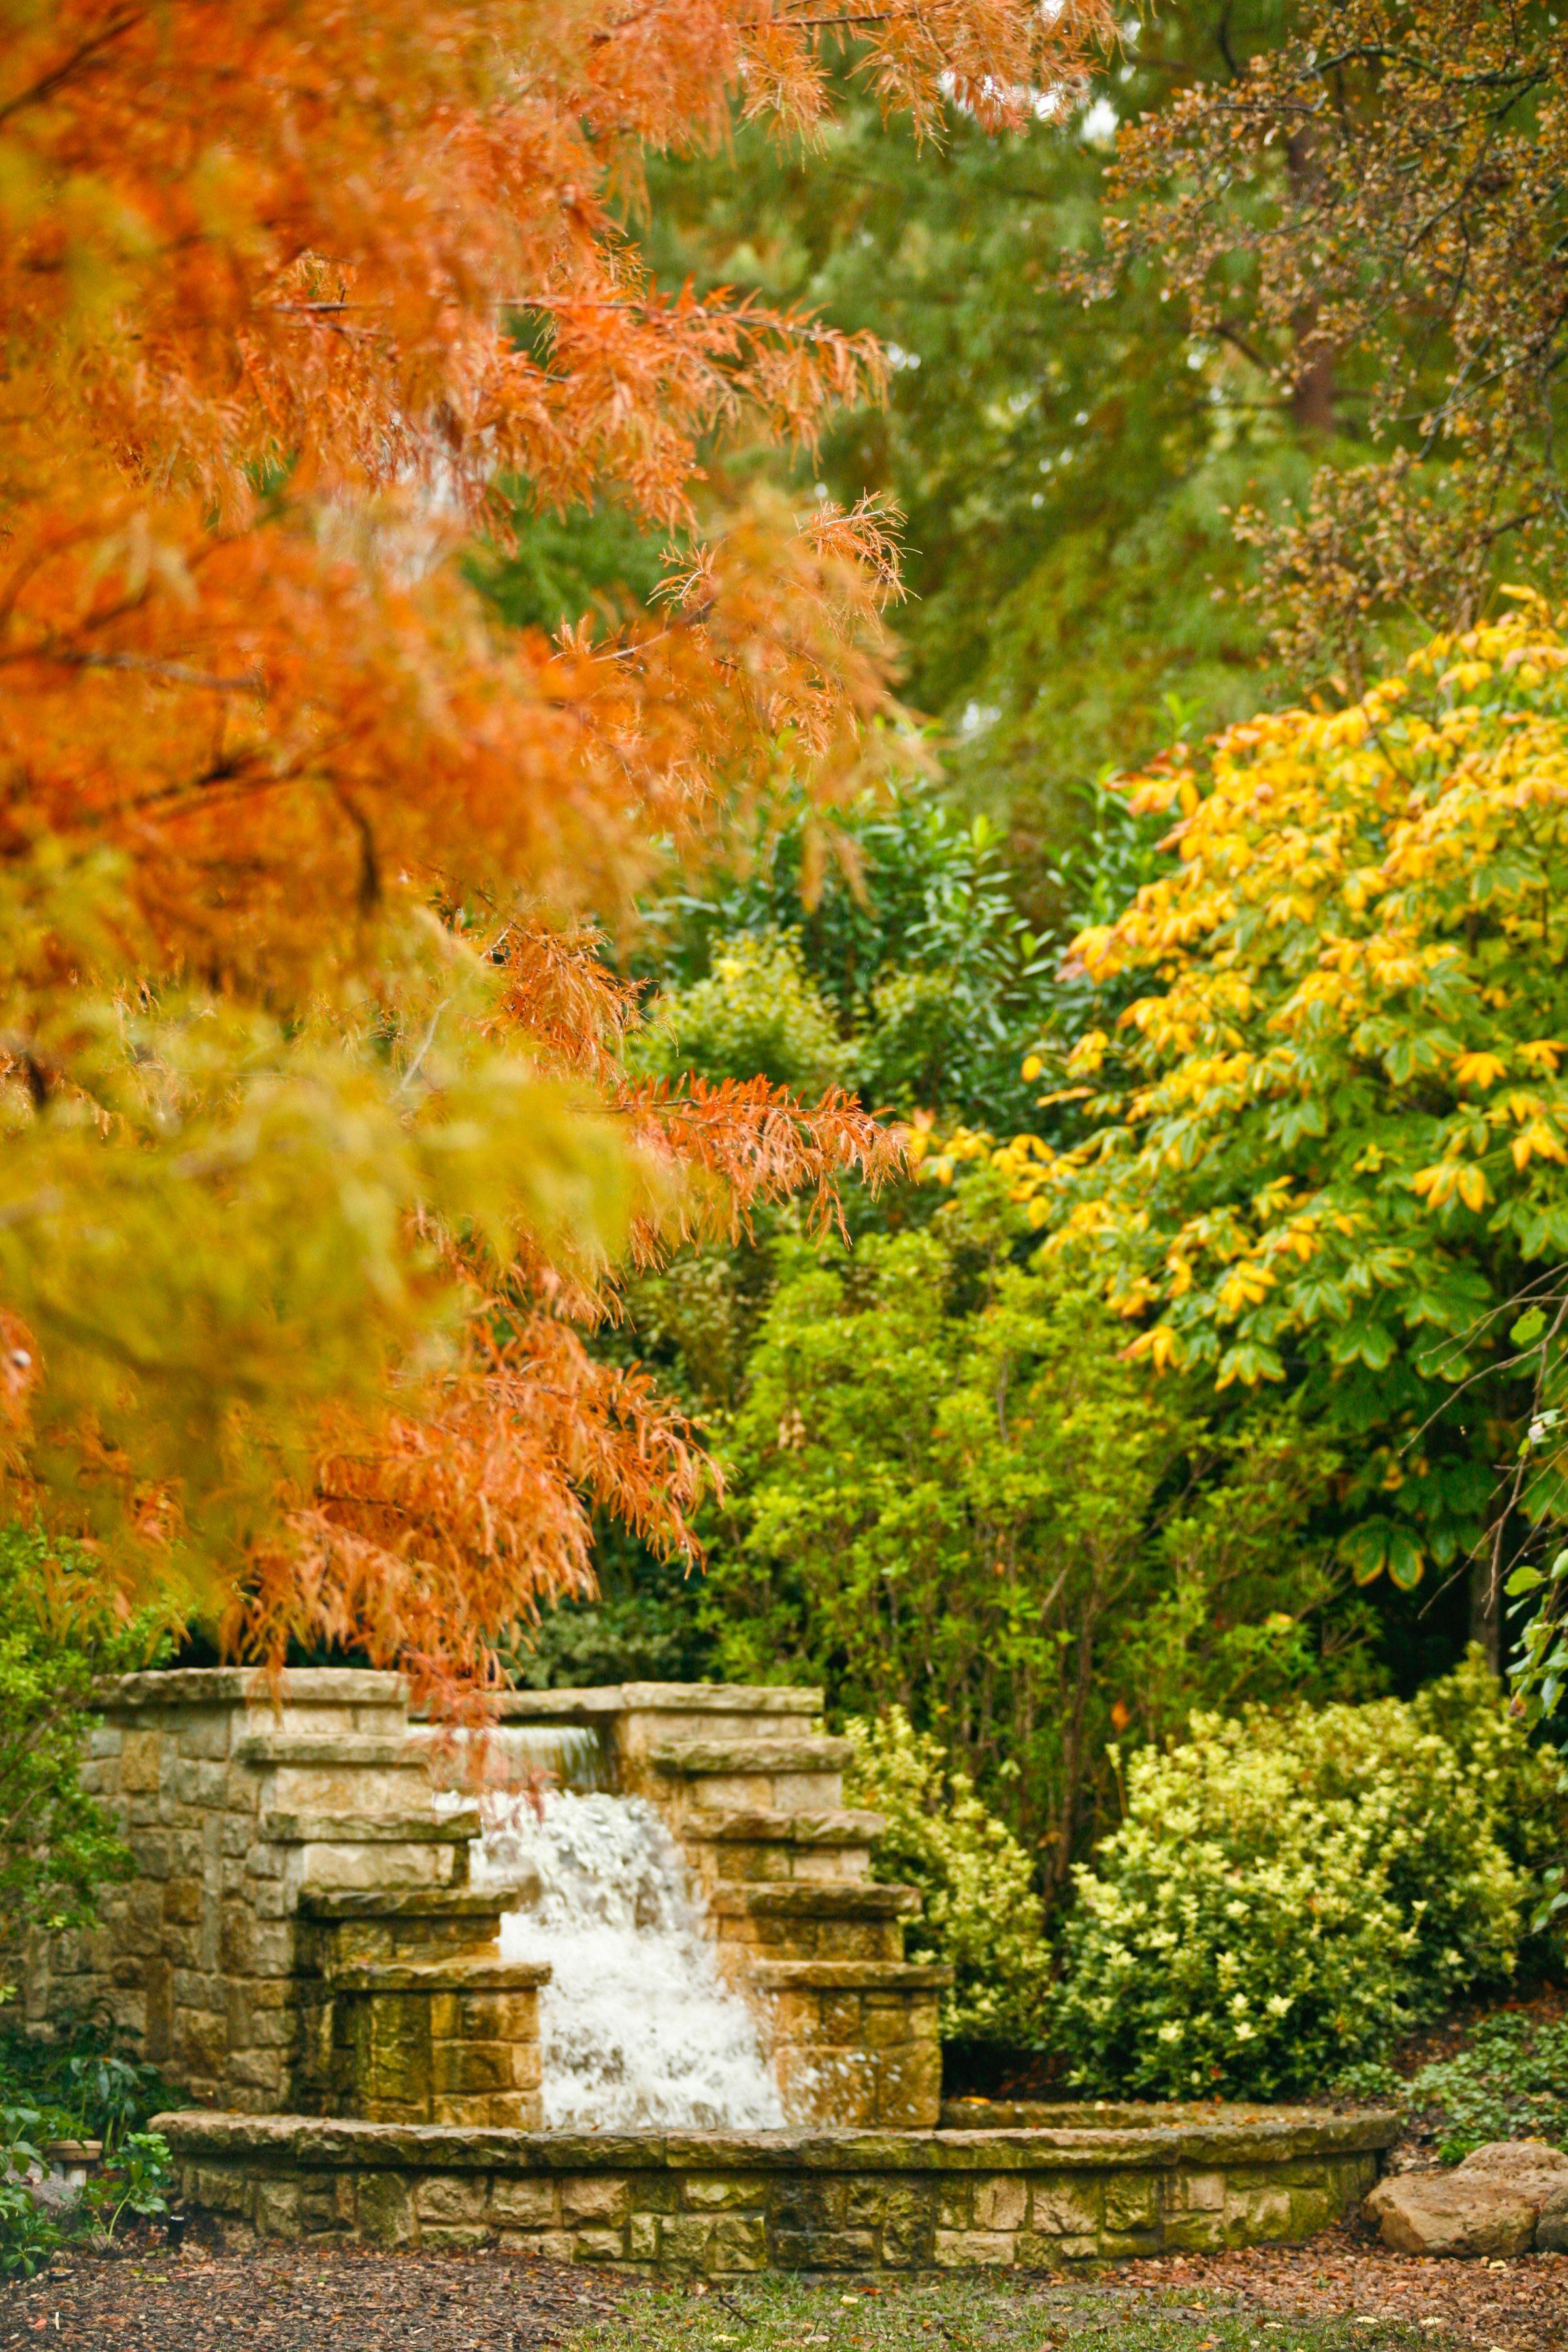 dallas arboretum autumn foliage in a woman u0027s garden autumn at